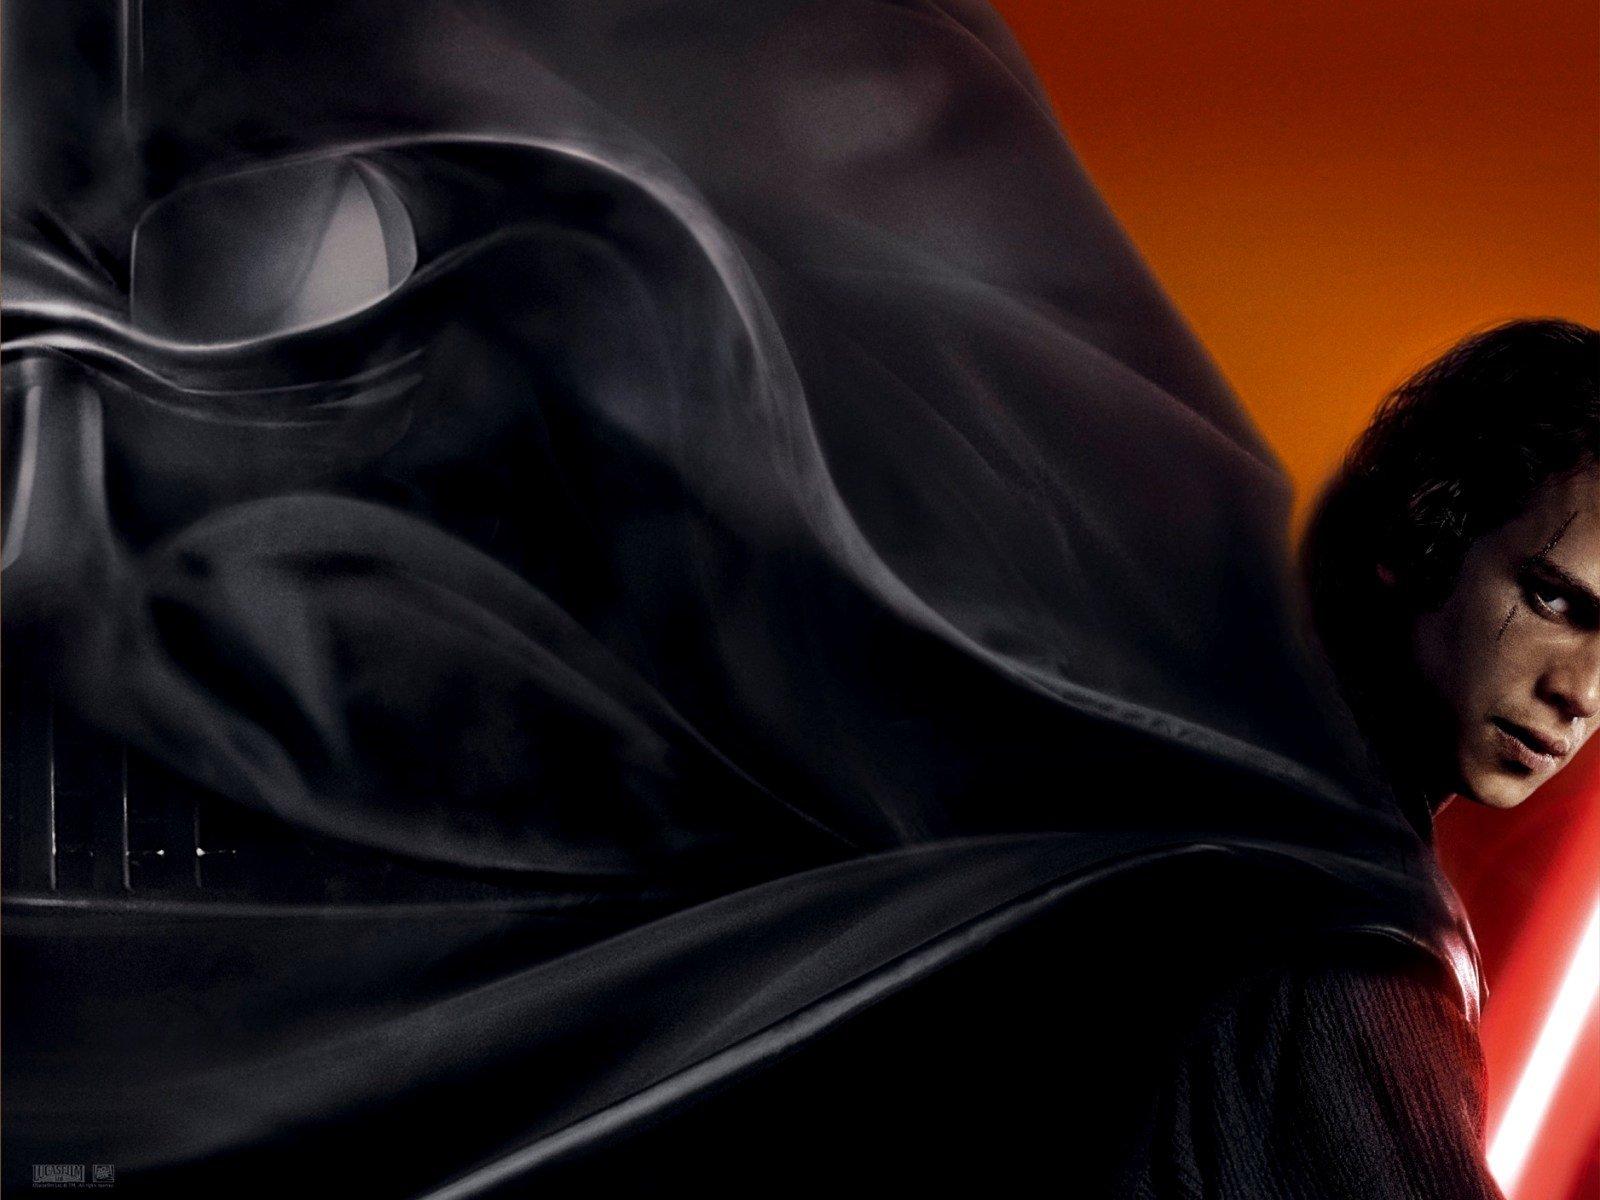 Anakin Skywalker Wallpapers Hd For Desktop Backgrounds